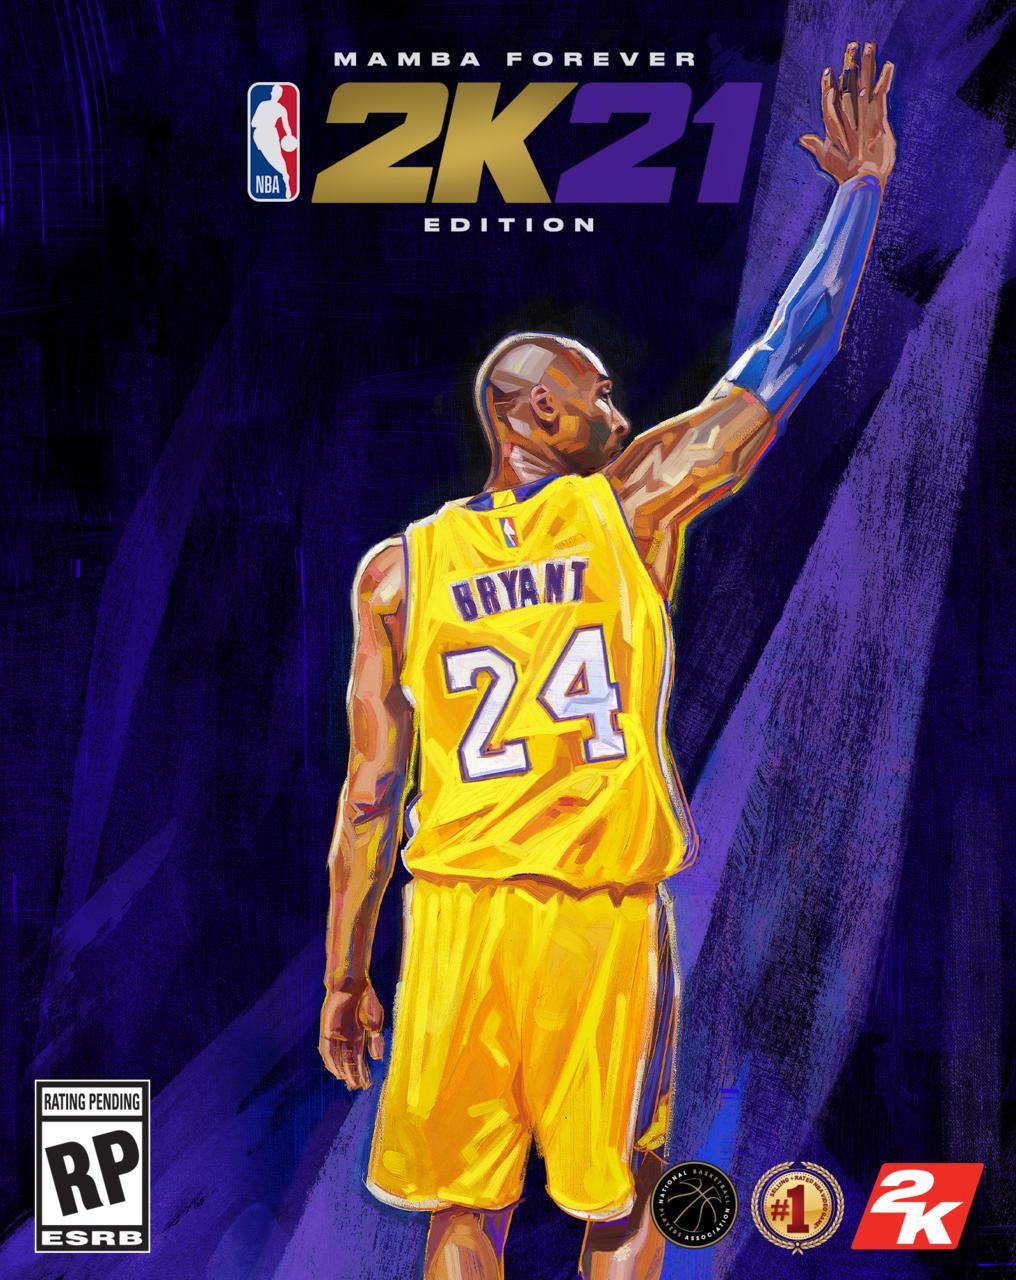 NBA 2K21 Mamba Forever edition box art on PS5/Xbox Series X